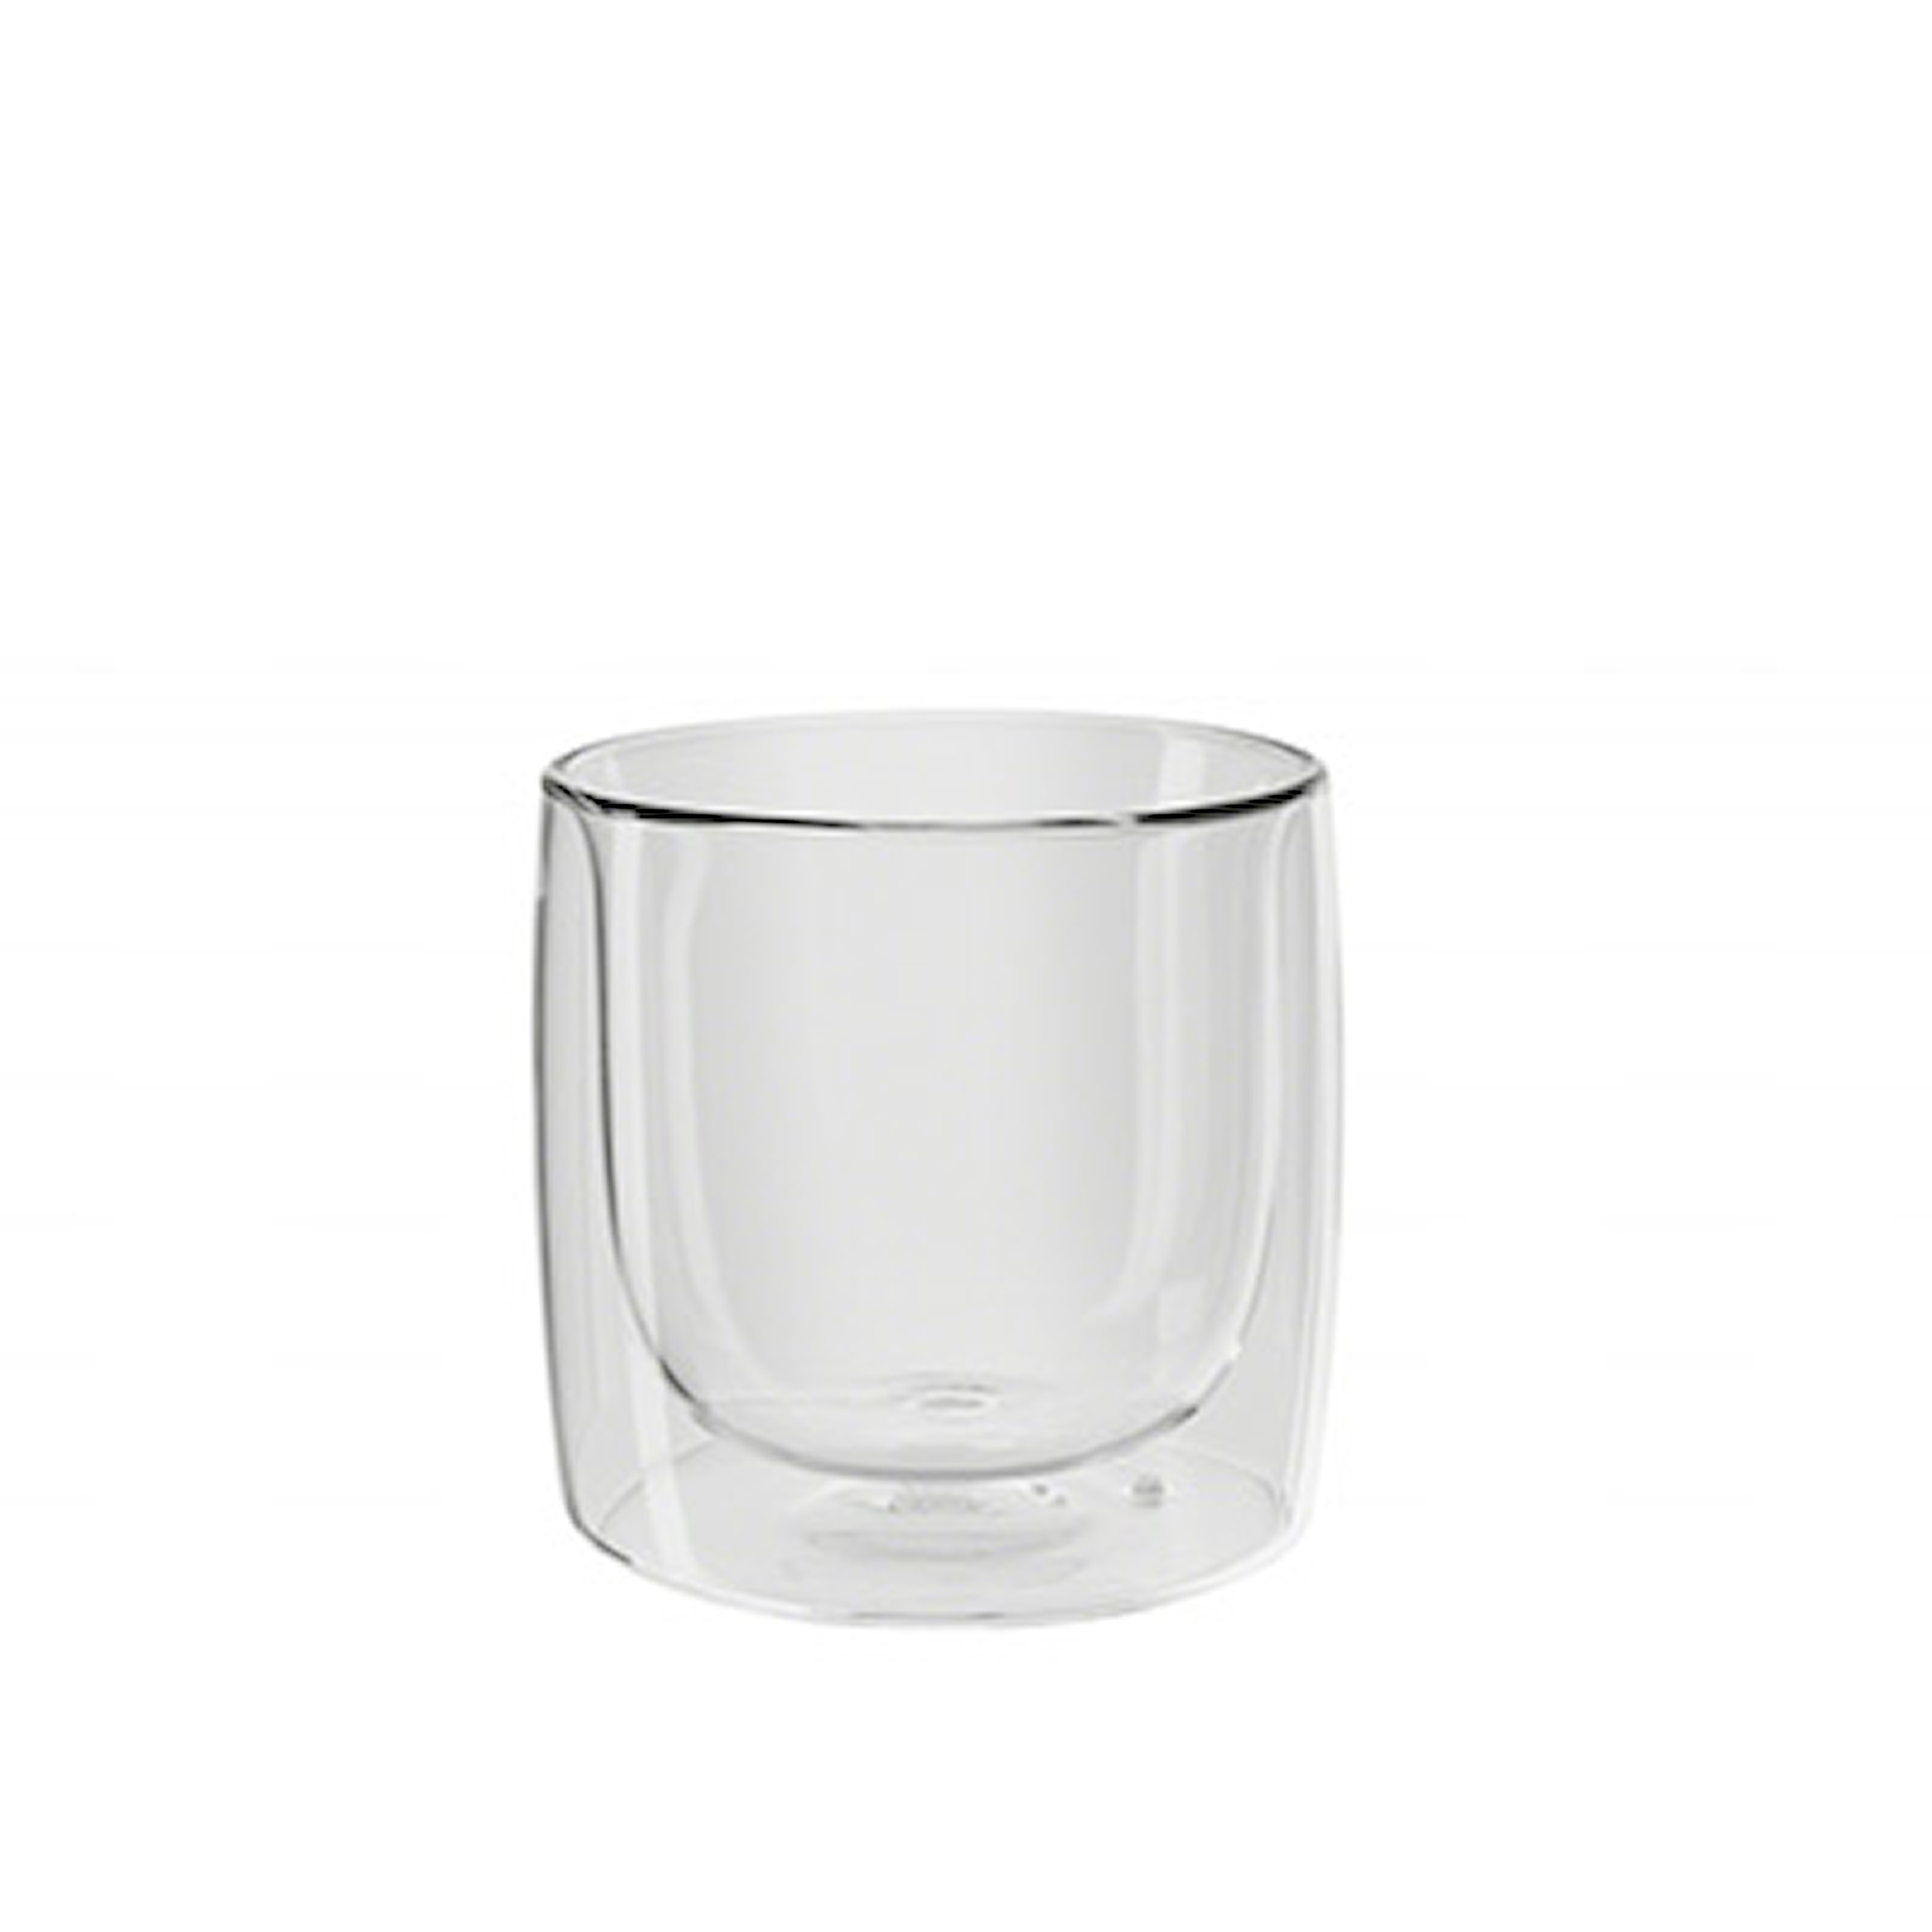 Whiskyglass, Whiskyglas, ,